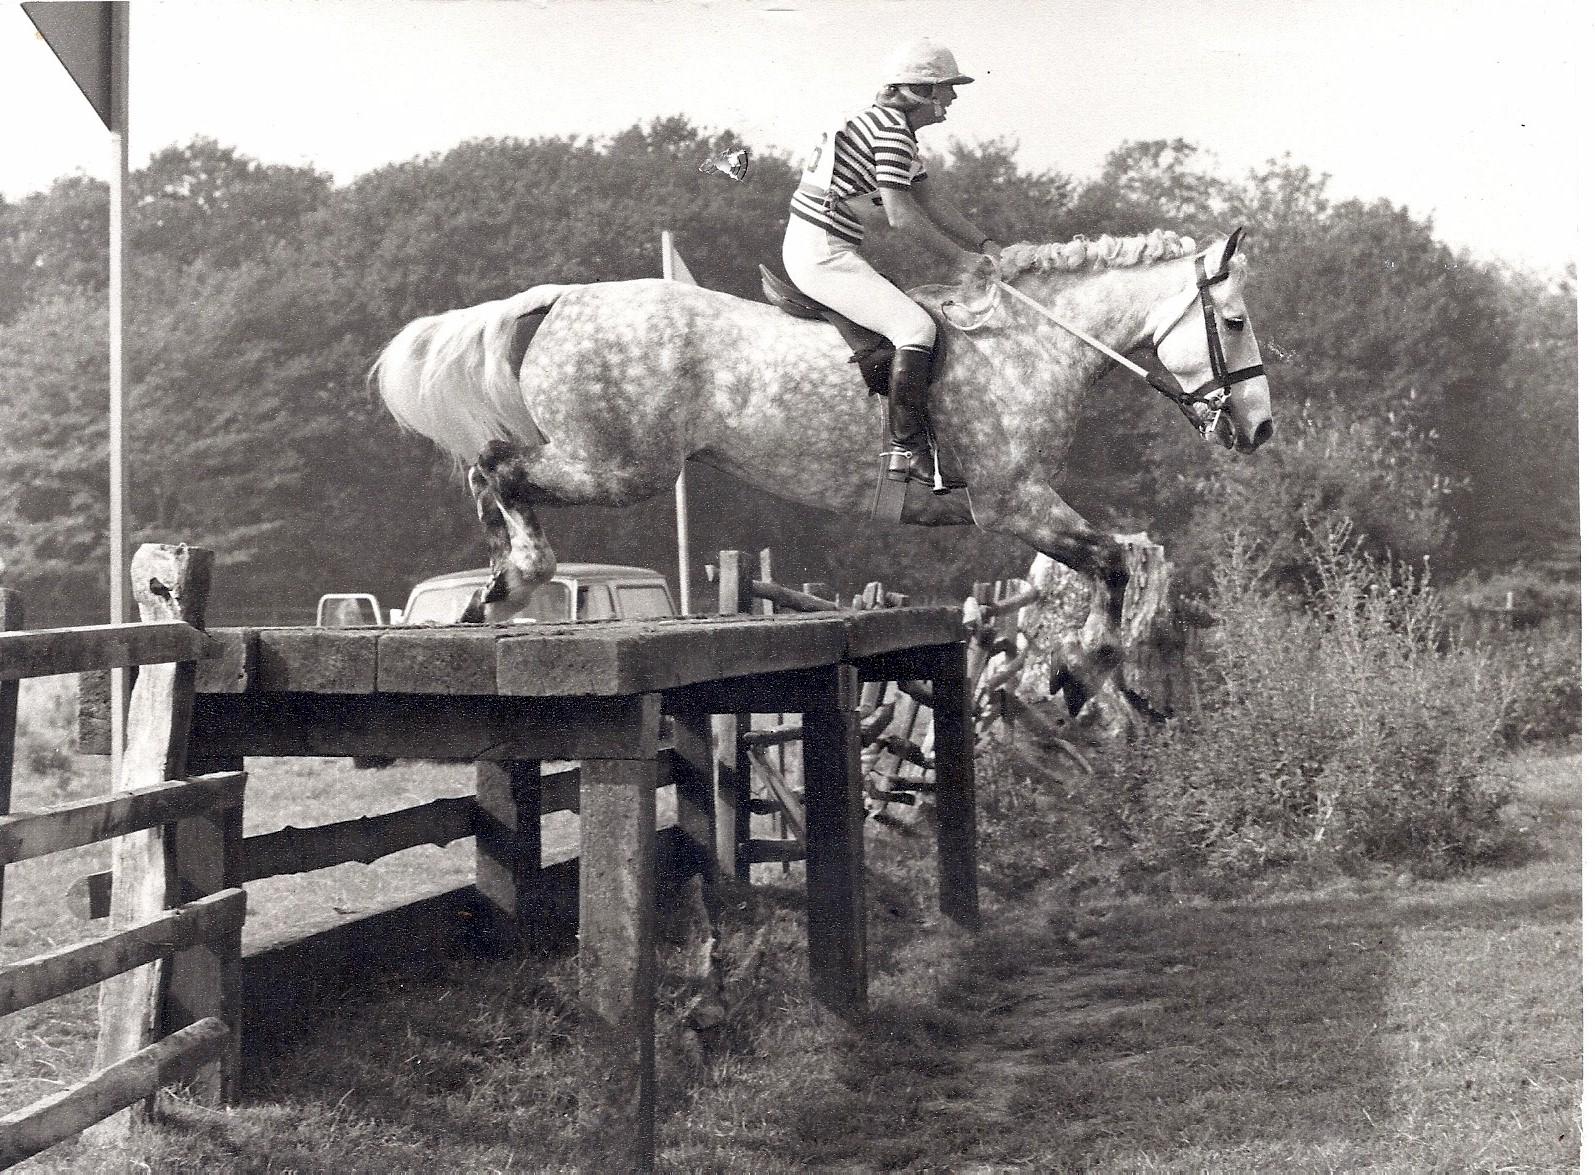 Lindsay & Blarney 1972